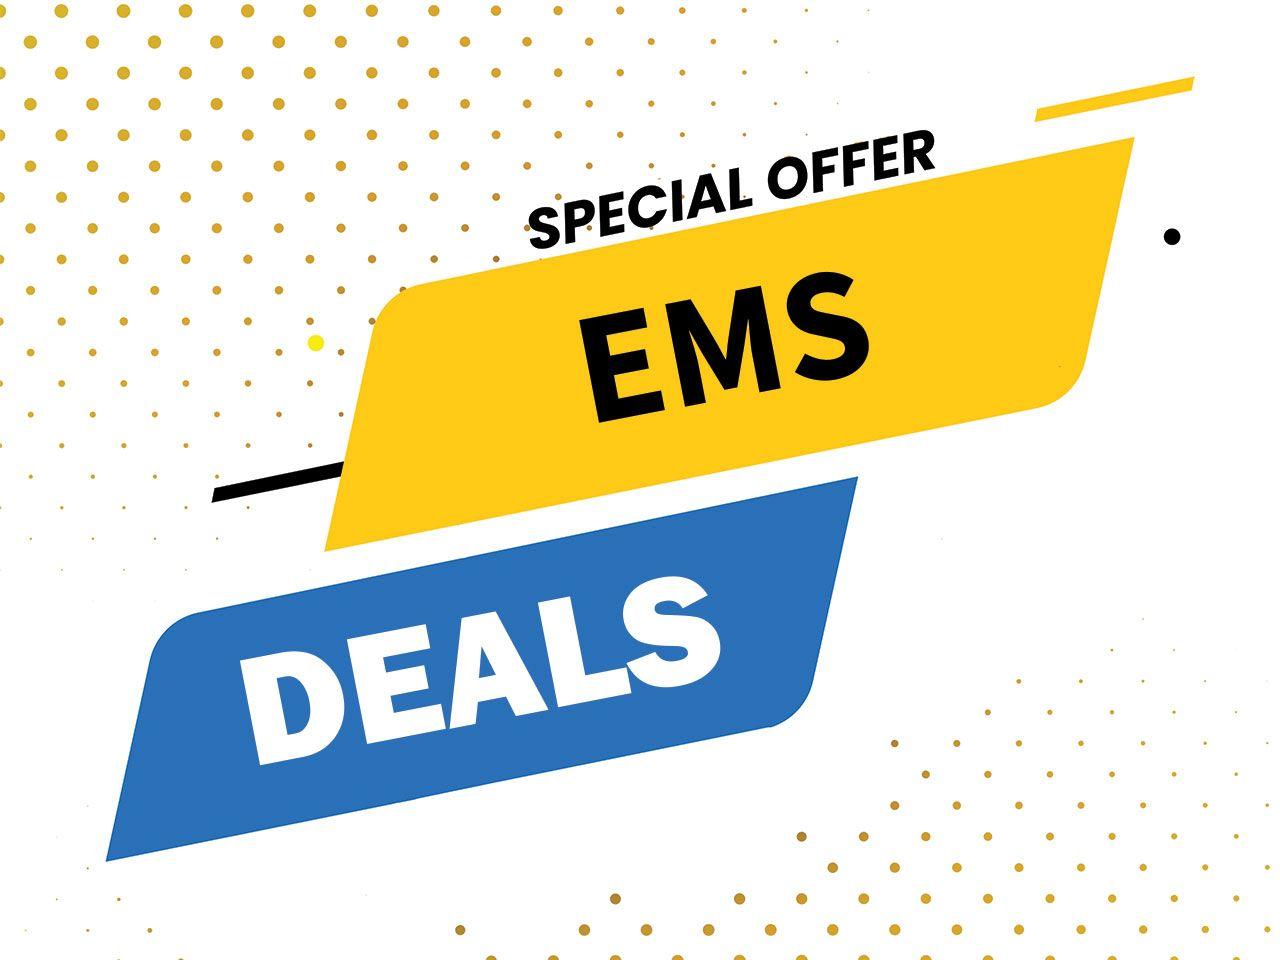 EMS Deals